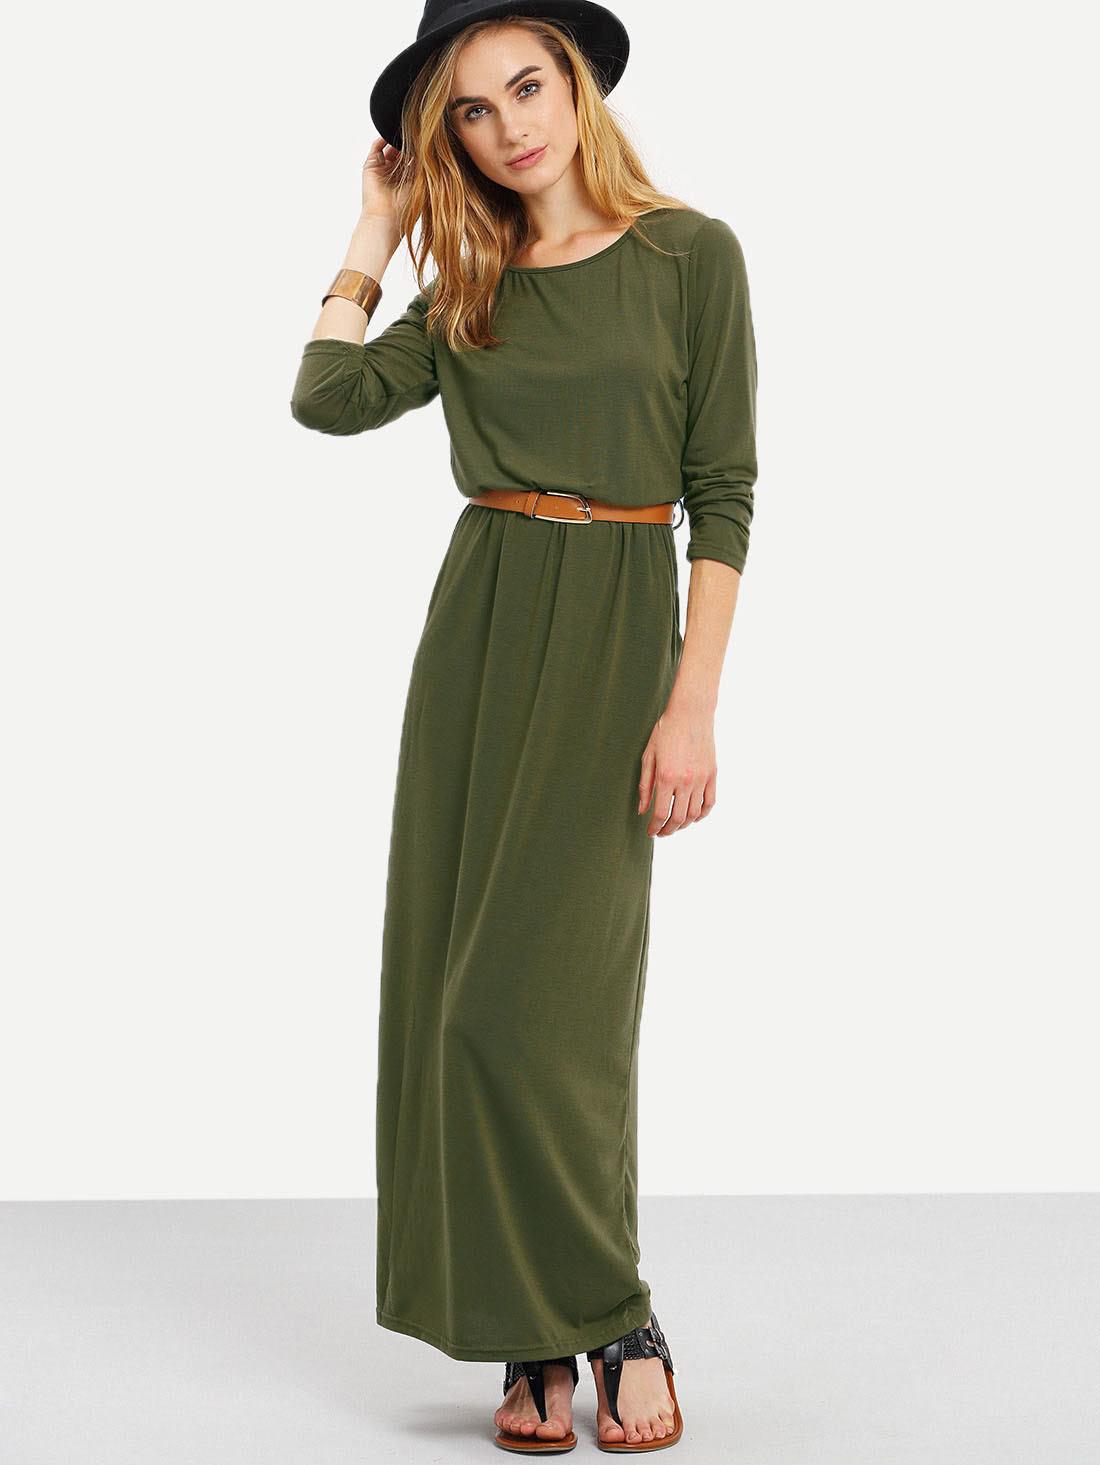 65 inch maxi dress